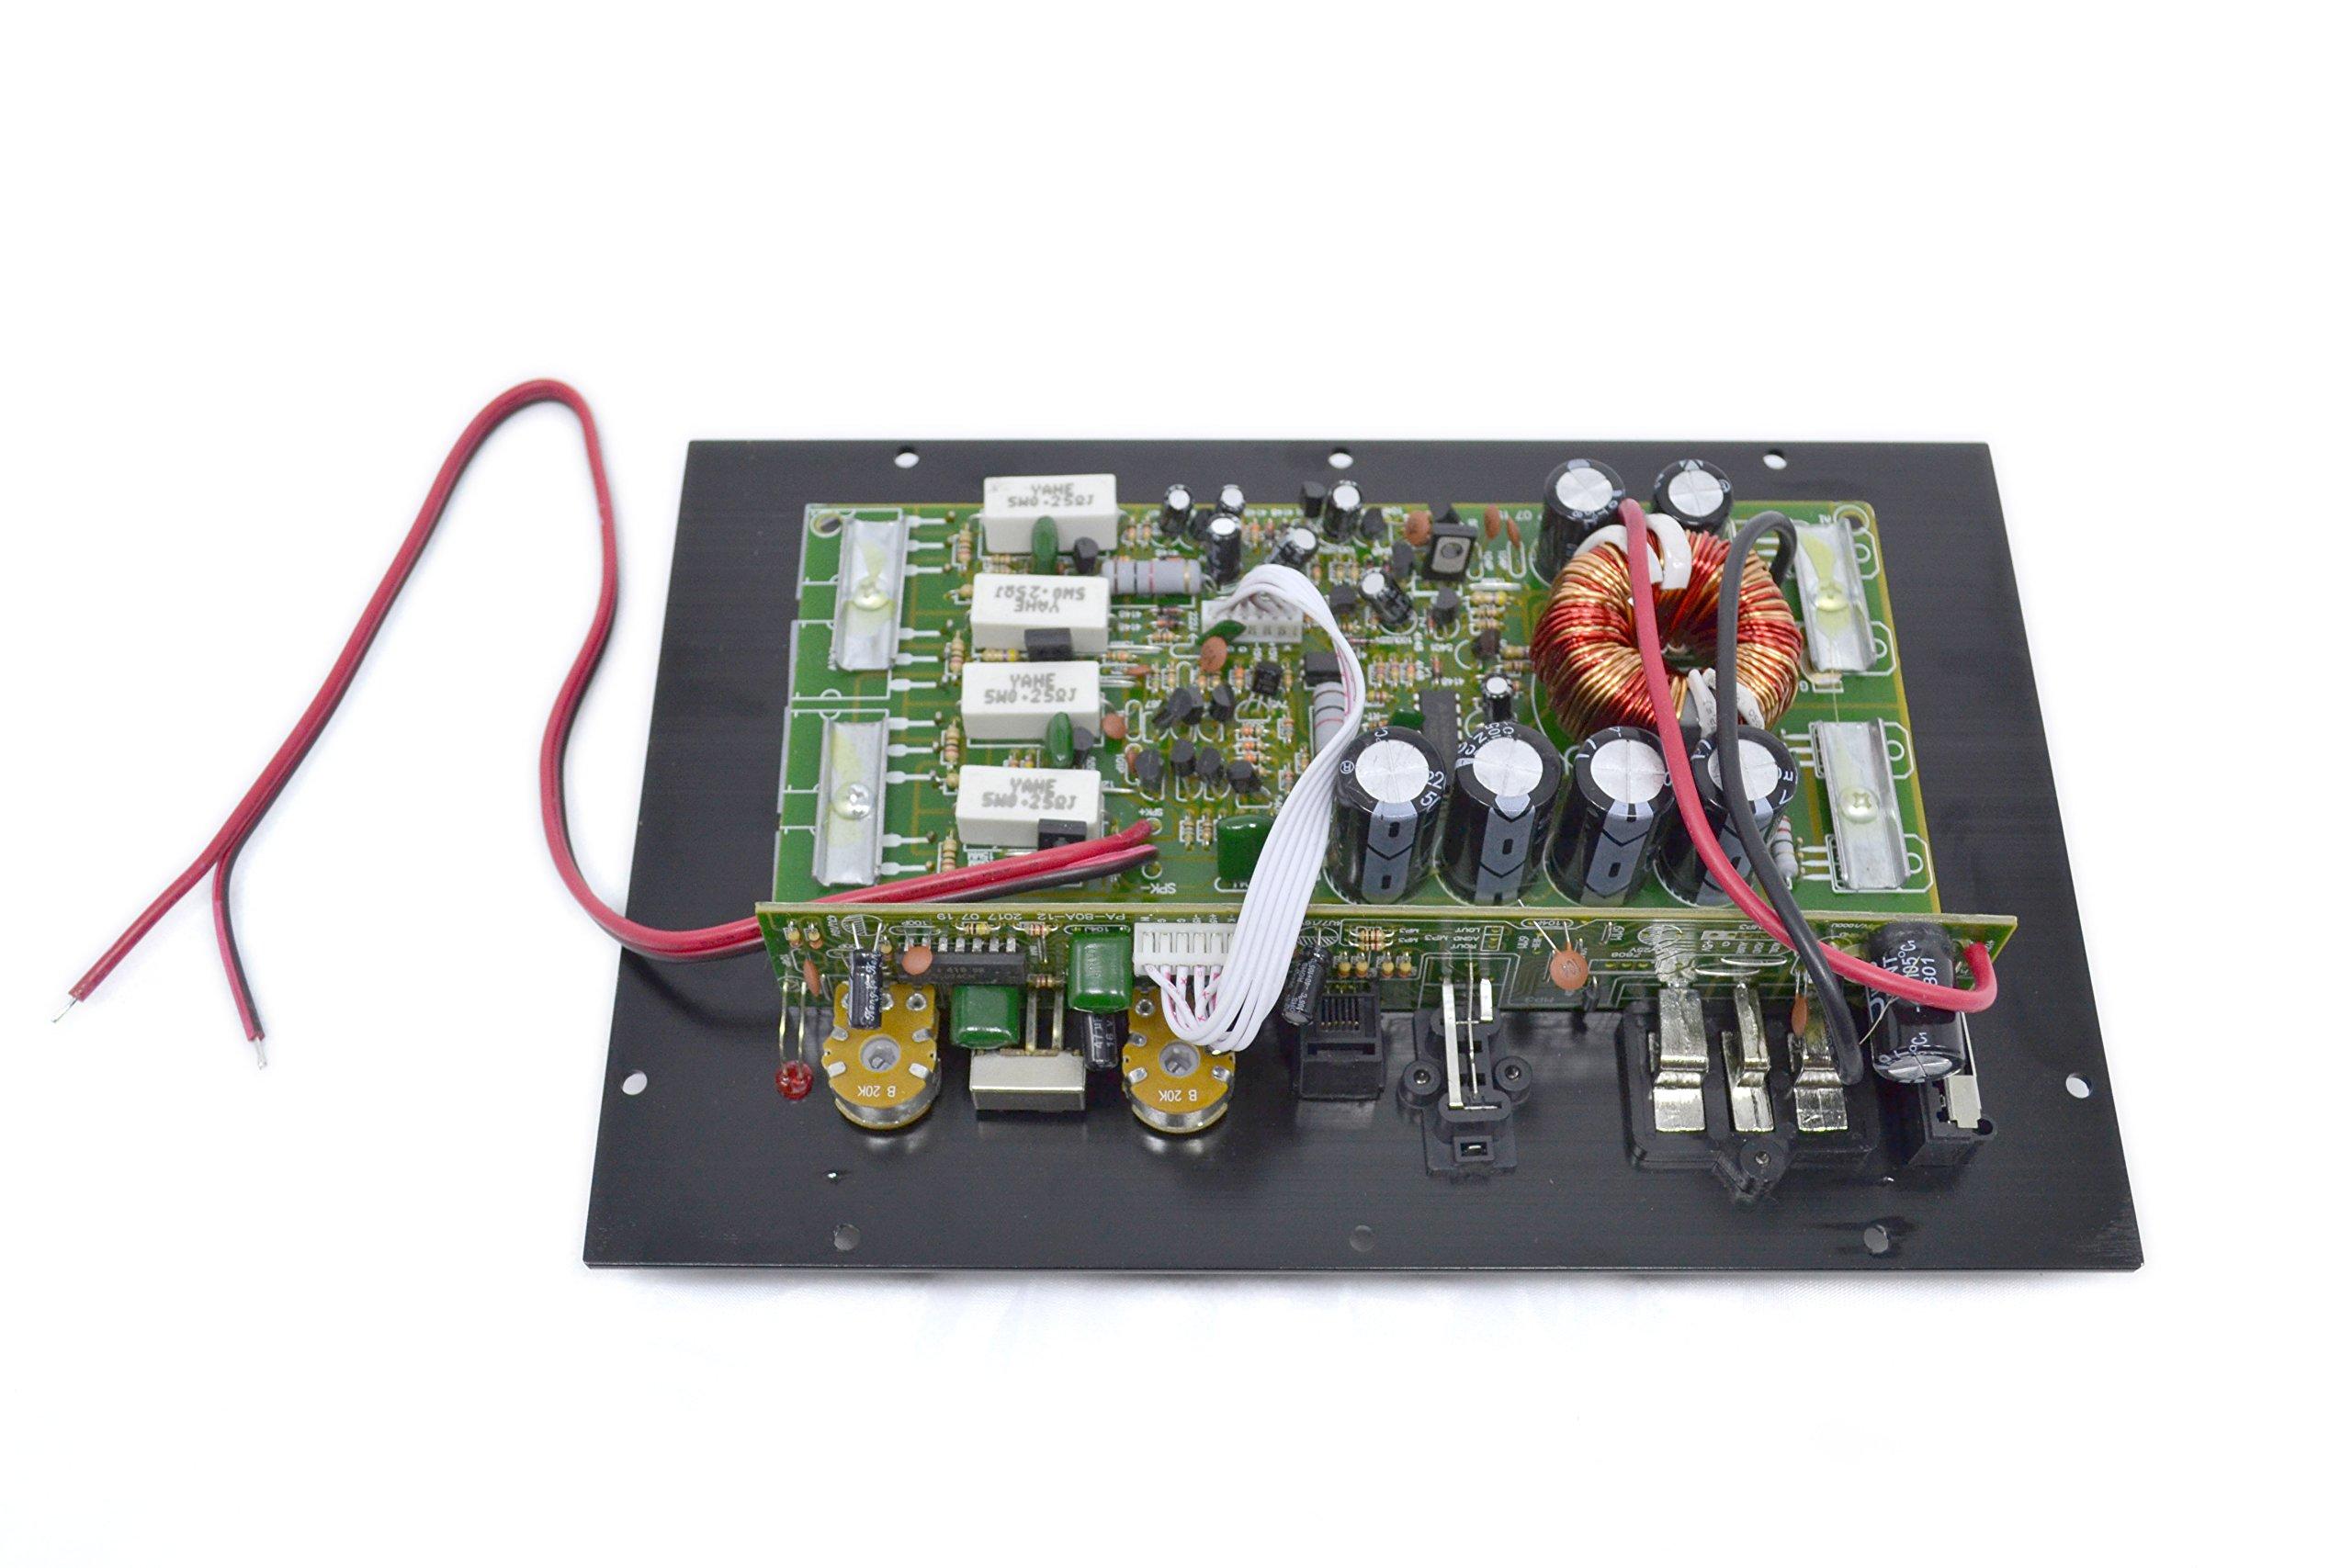 PA-80D Car Amplifie 1000W High Power Tube Amplifier Subwoofer Amplifier by bass audio (Image #6)